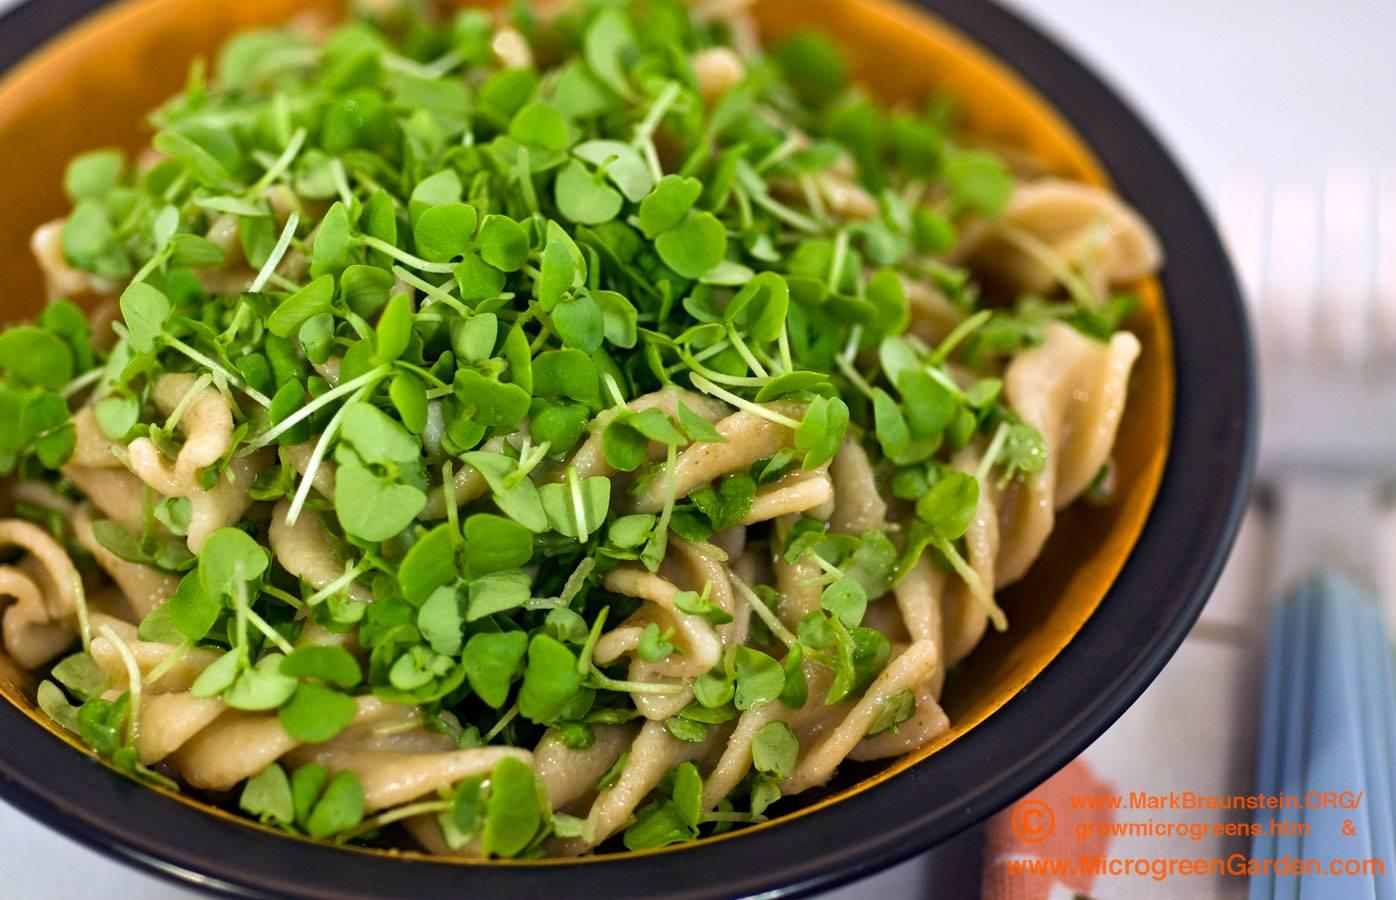 pasta and pesto - BASIL microgreens, 7 1/2 days since sown